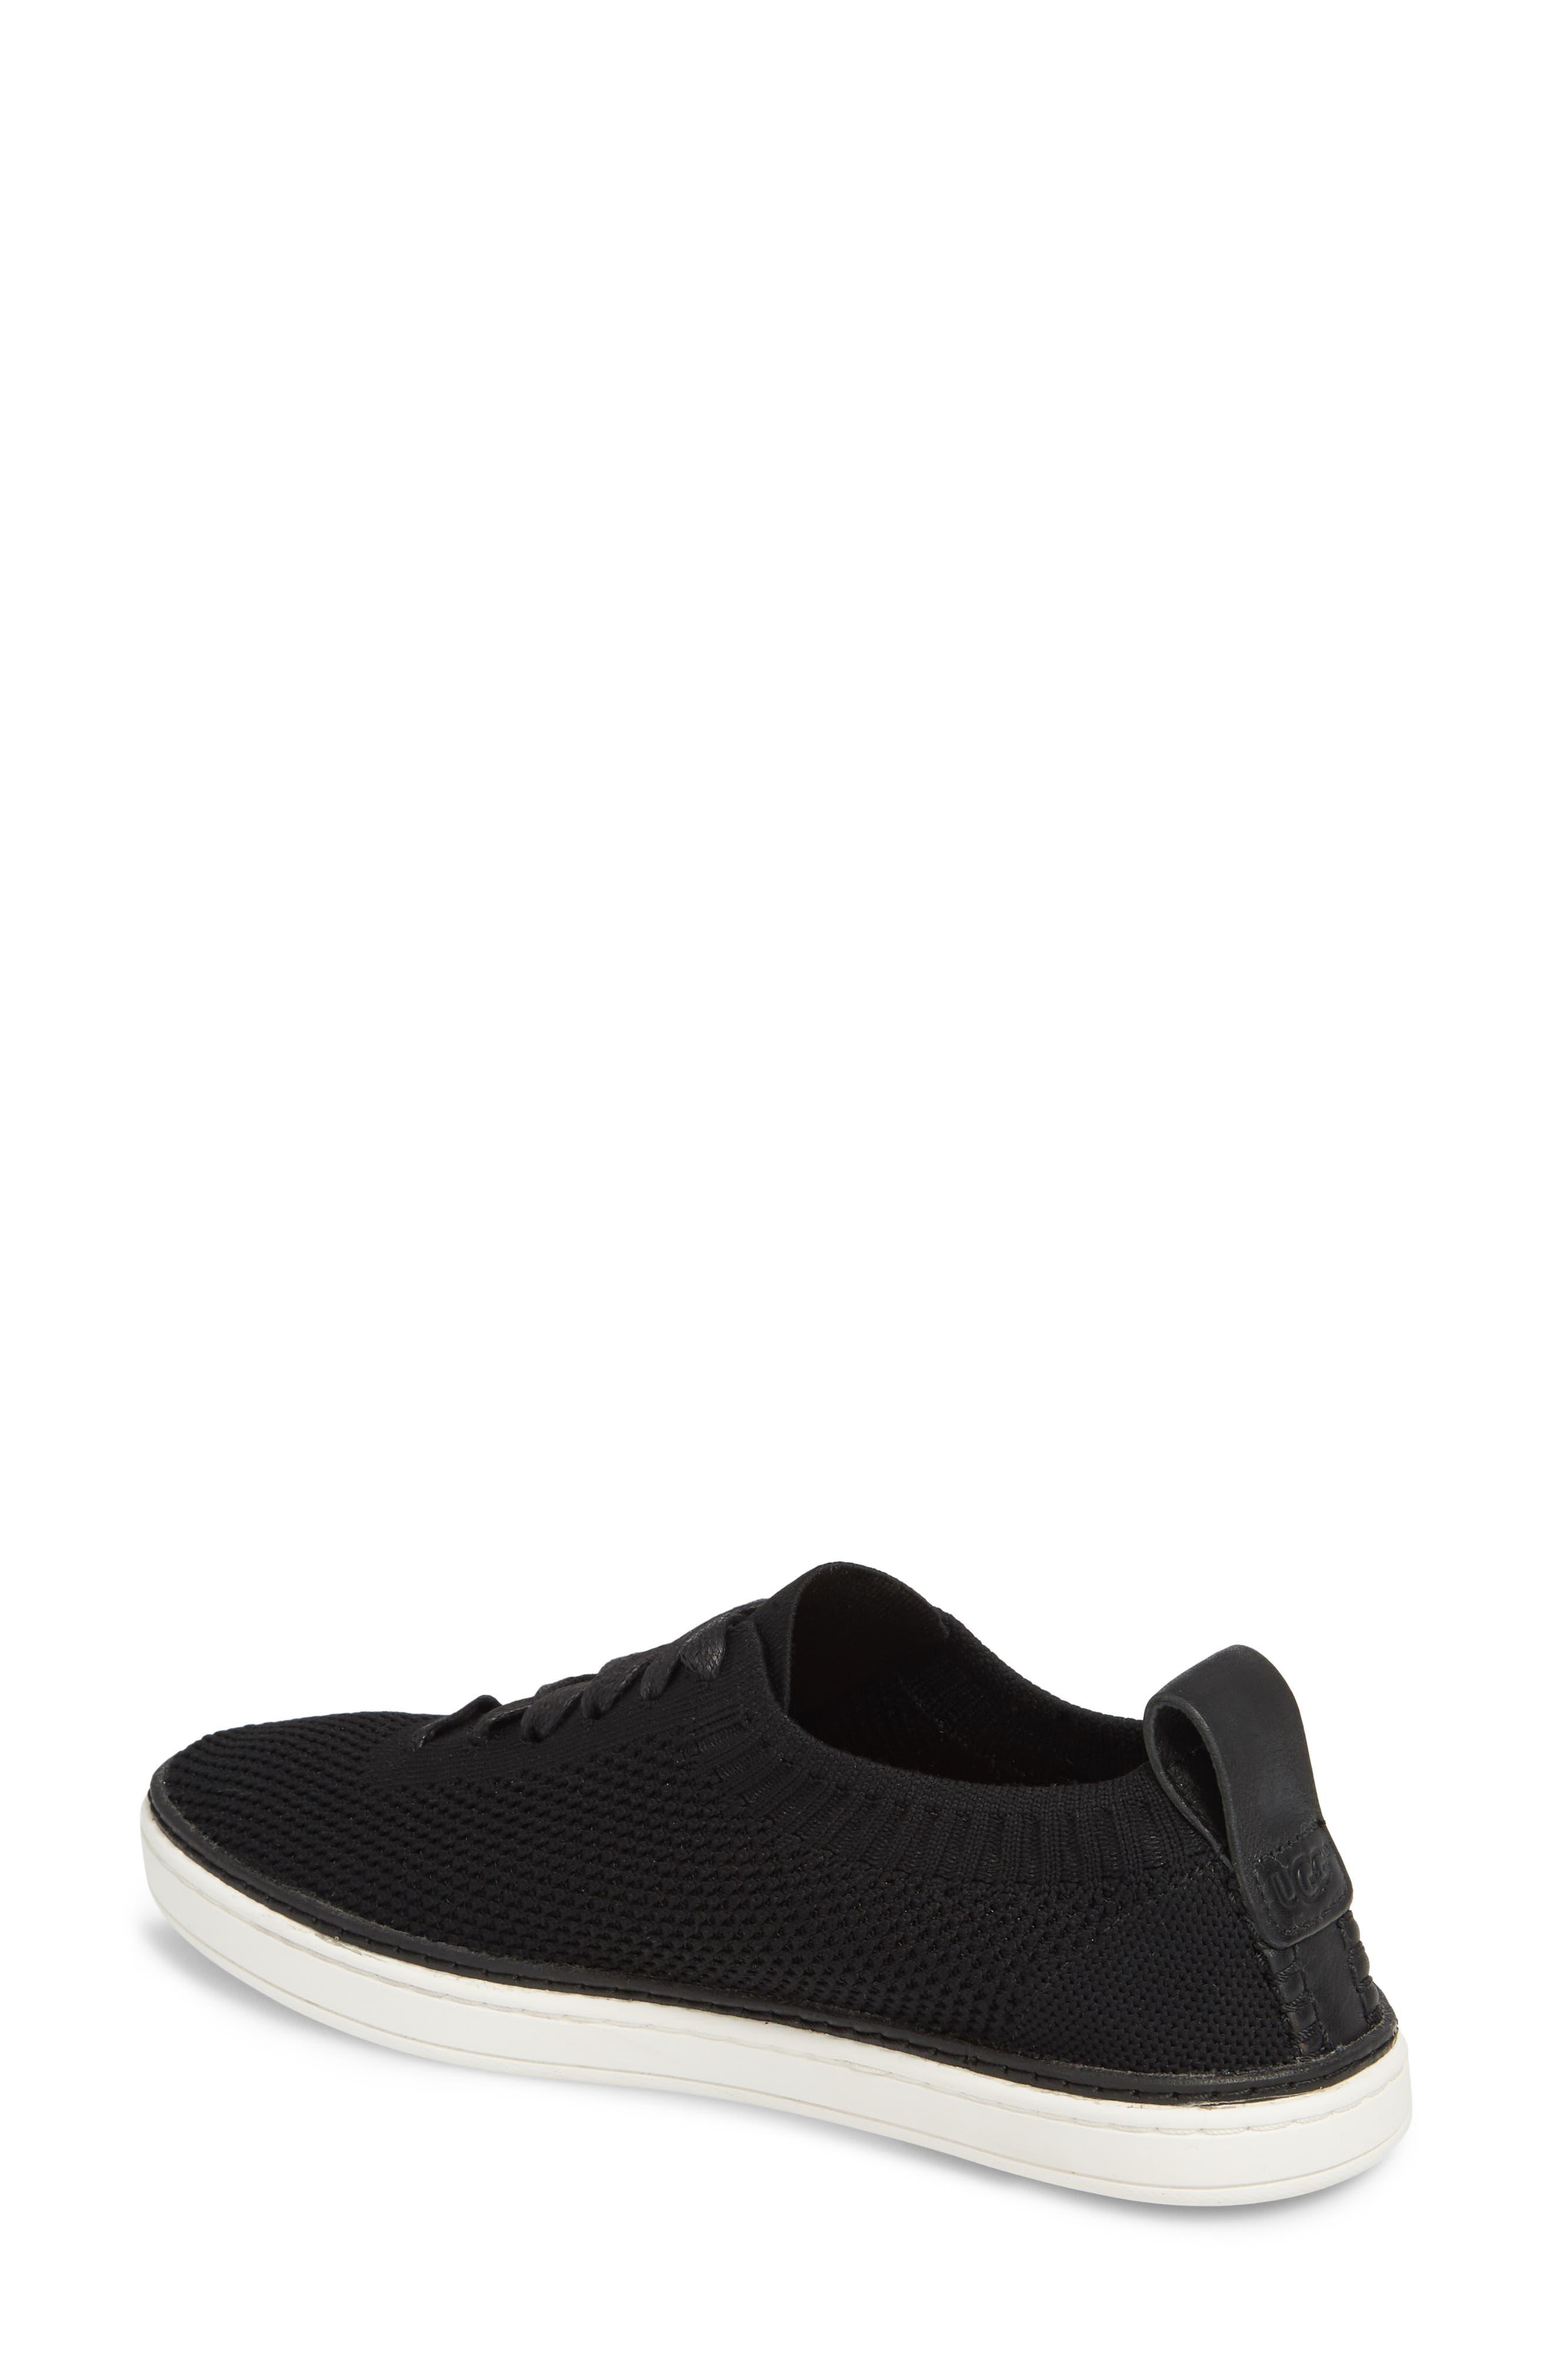 Sidney Sneaker,                             Alternate thumbnail 2, color,                             BLACK FABRIC